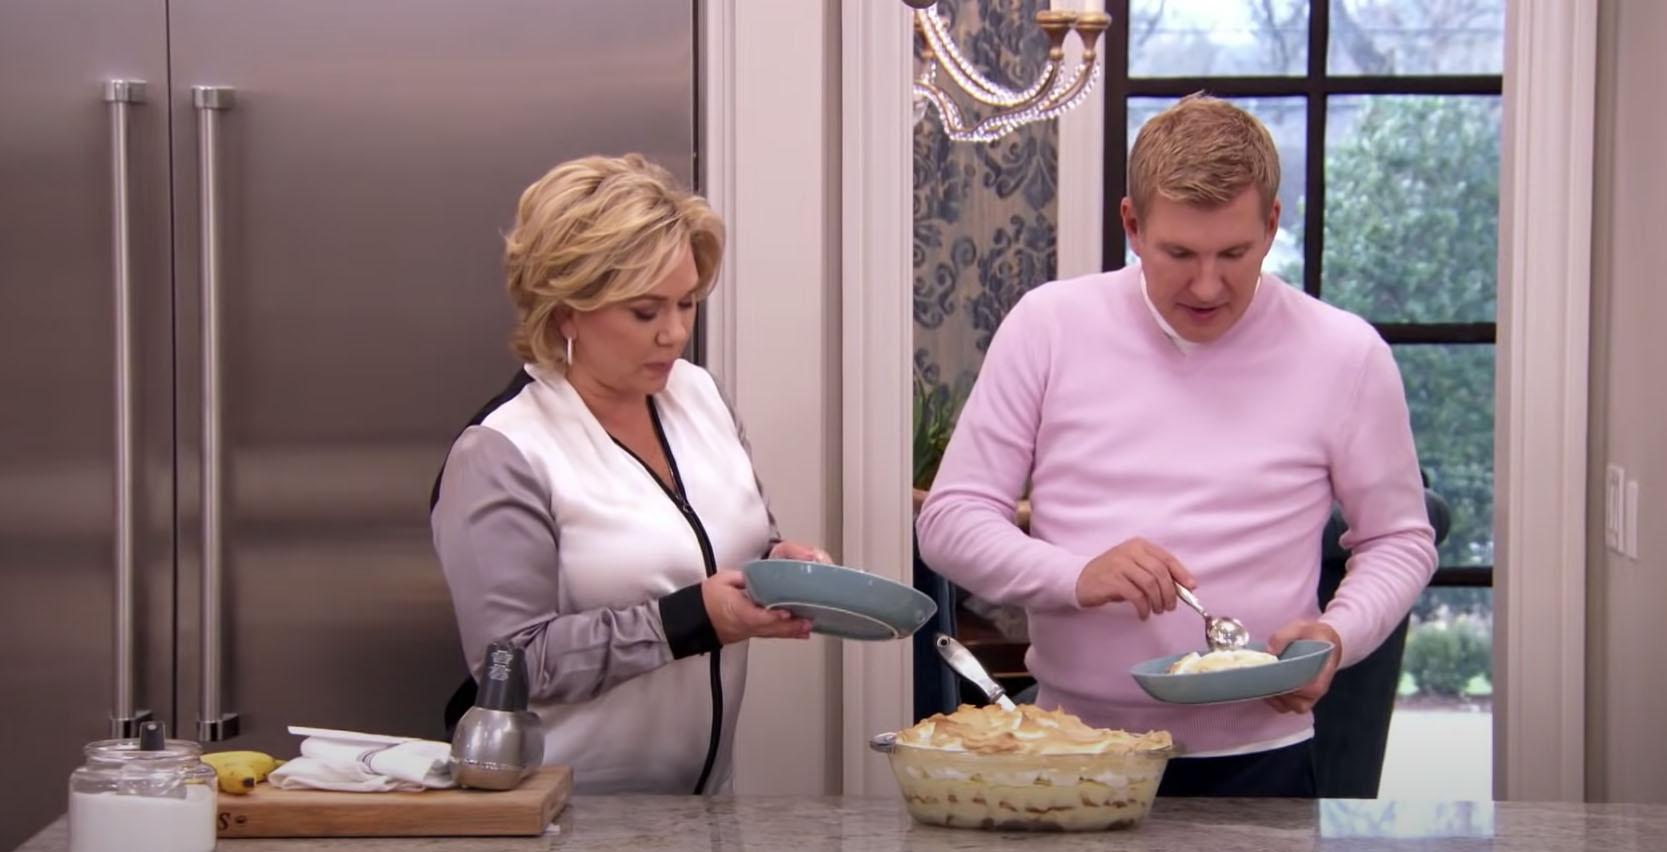 Chrisley Knows Best Julie Chrisley cookbook